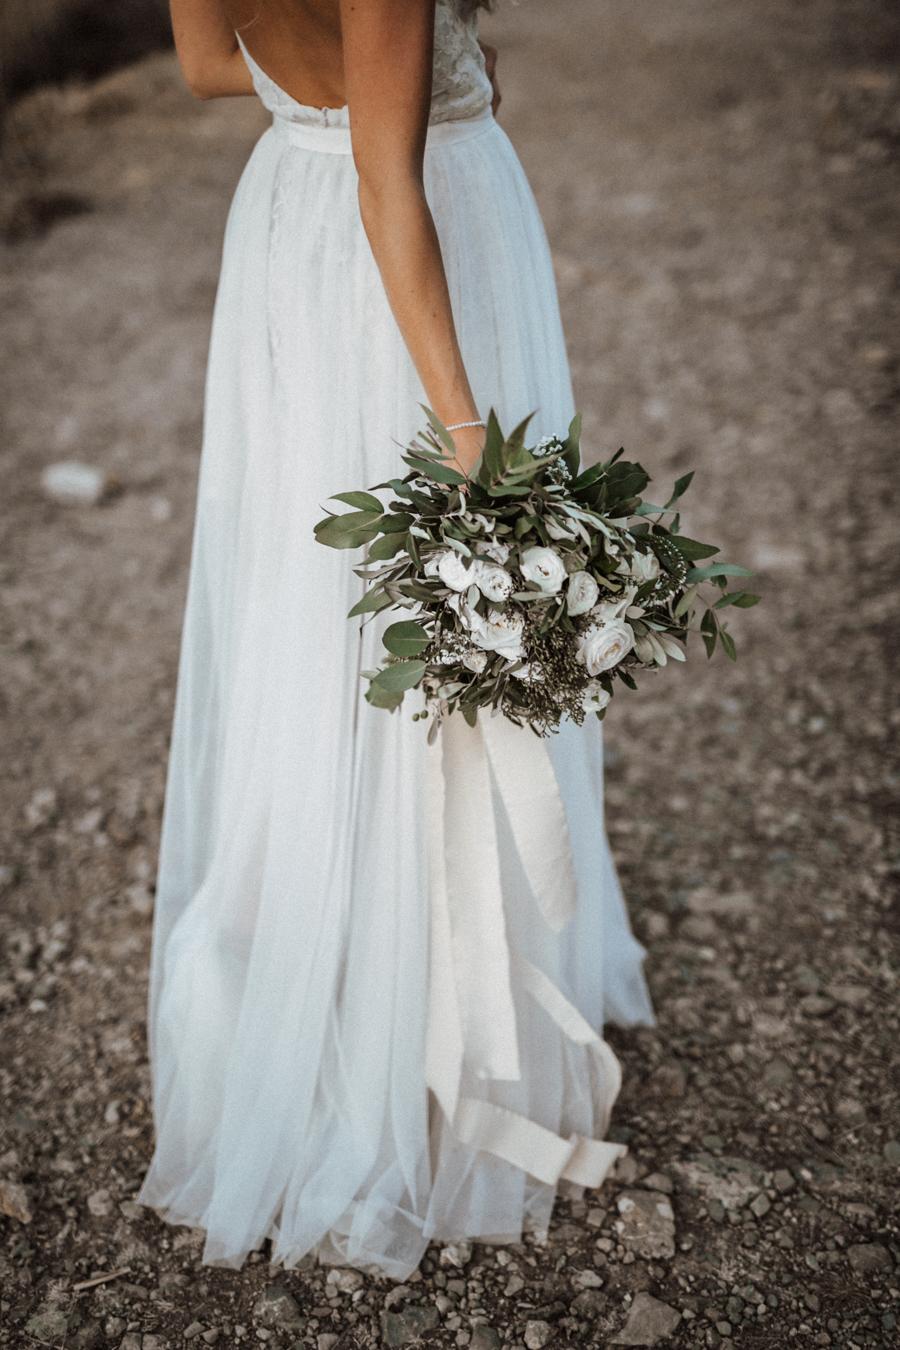 Boho Hochzeitsinspiration Auf Mallorca Friedatheres Com